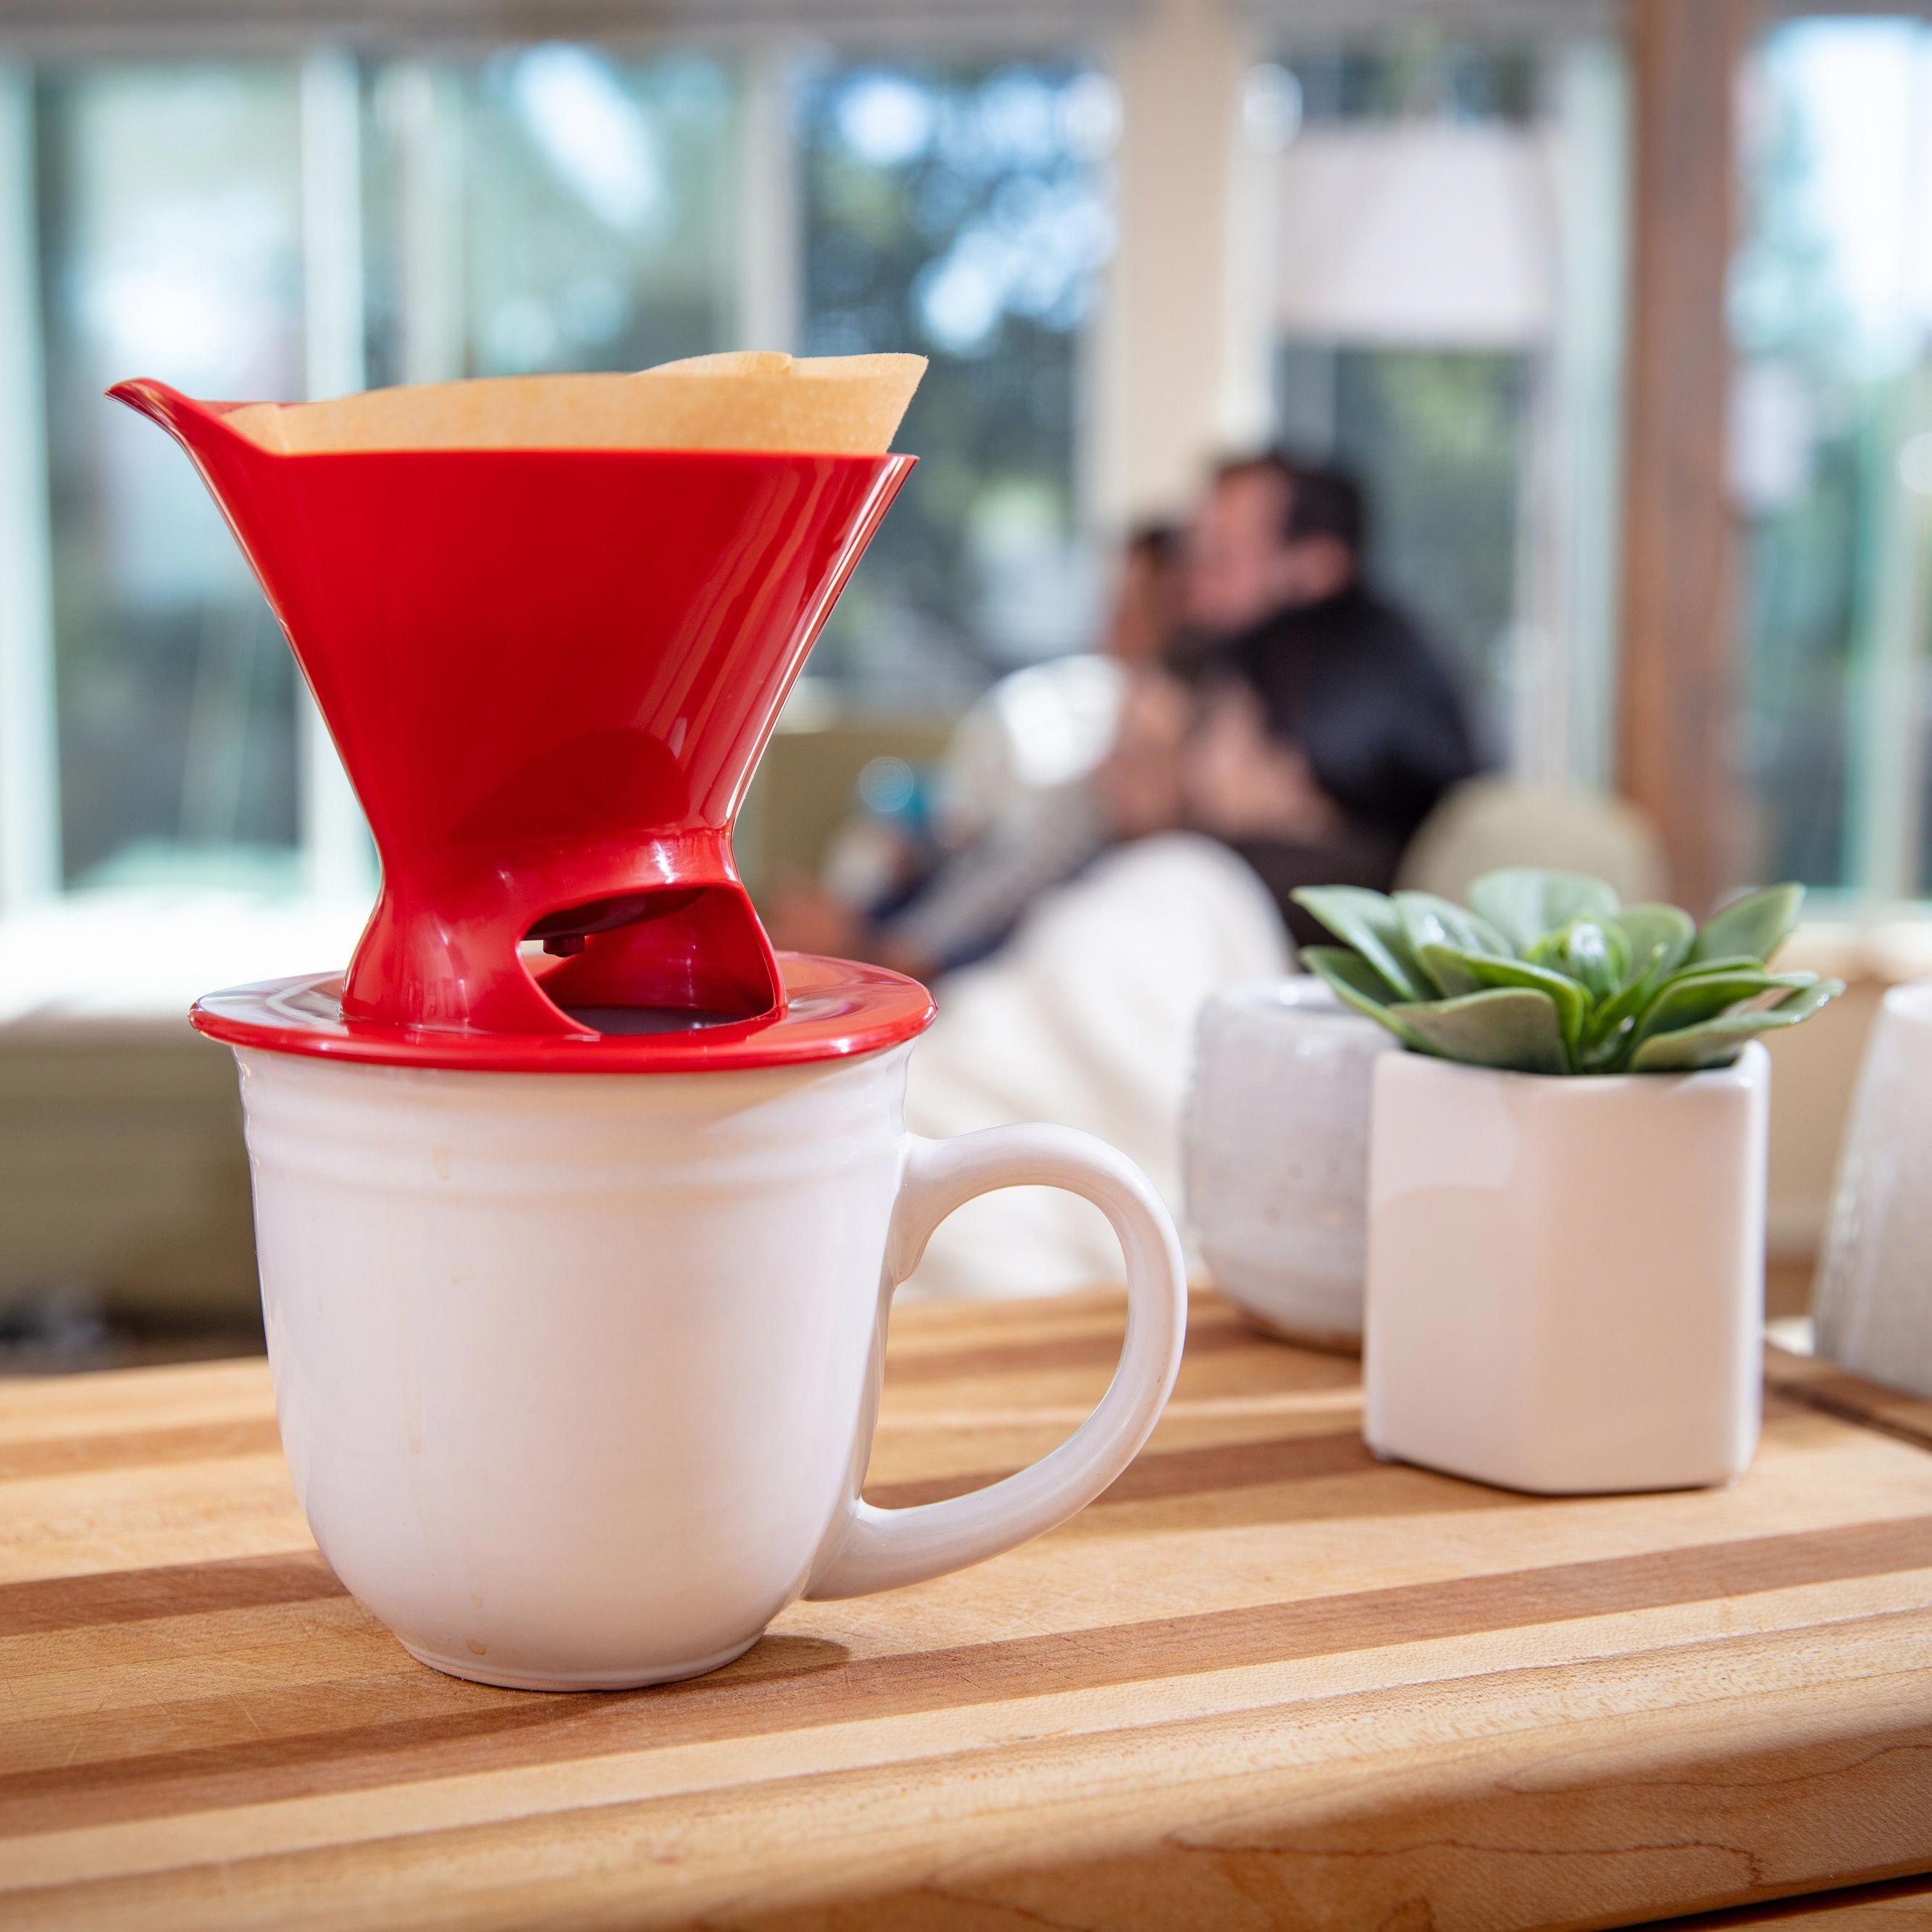 Coffee Travel Mugs CoffeeIsBadForHealth CoffeeMugs